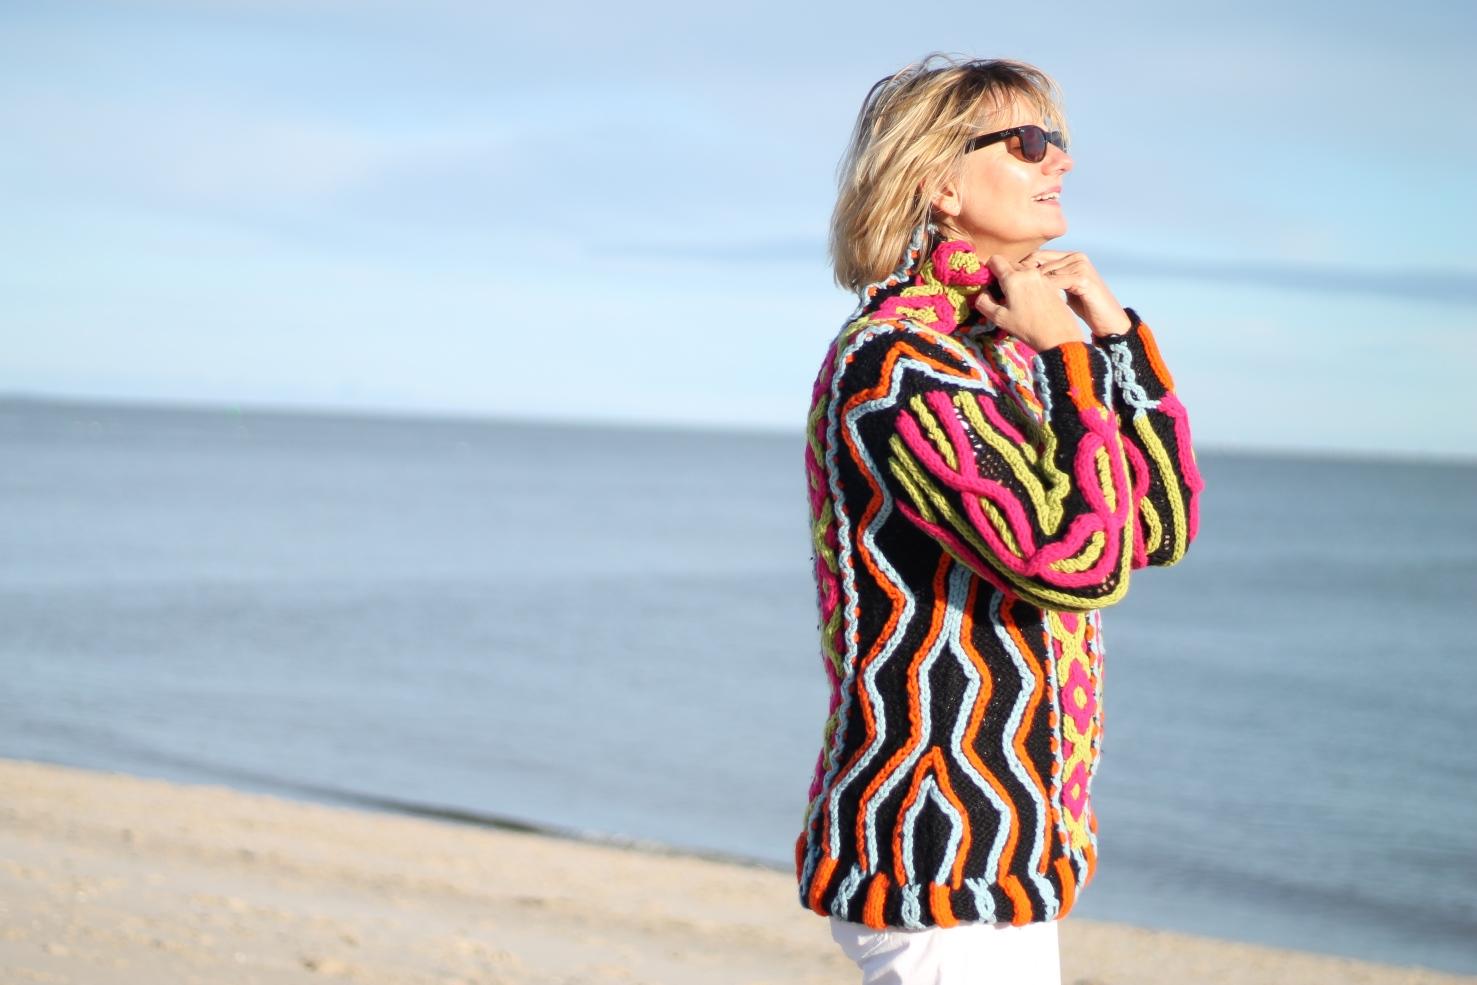 Pullover mit Neonfarben Christian Lacroix auf Sylt